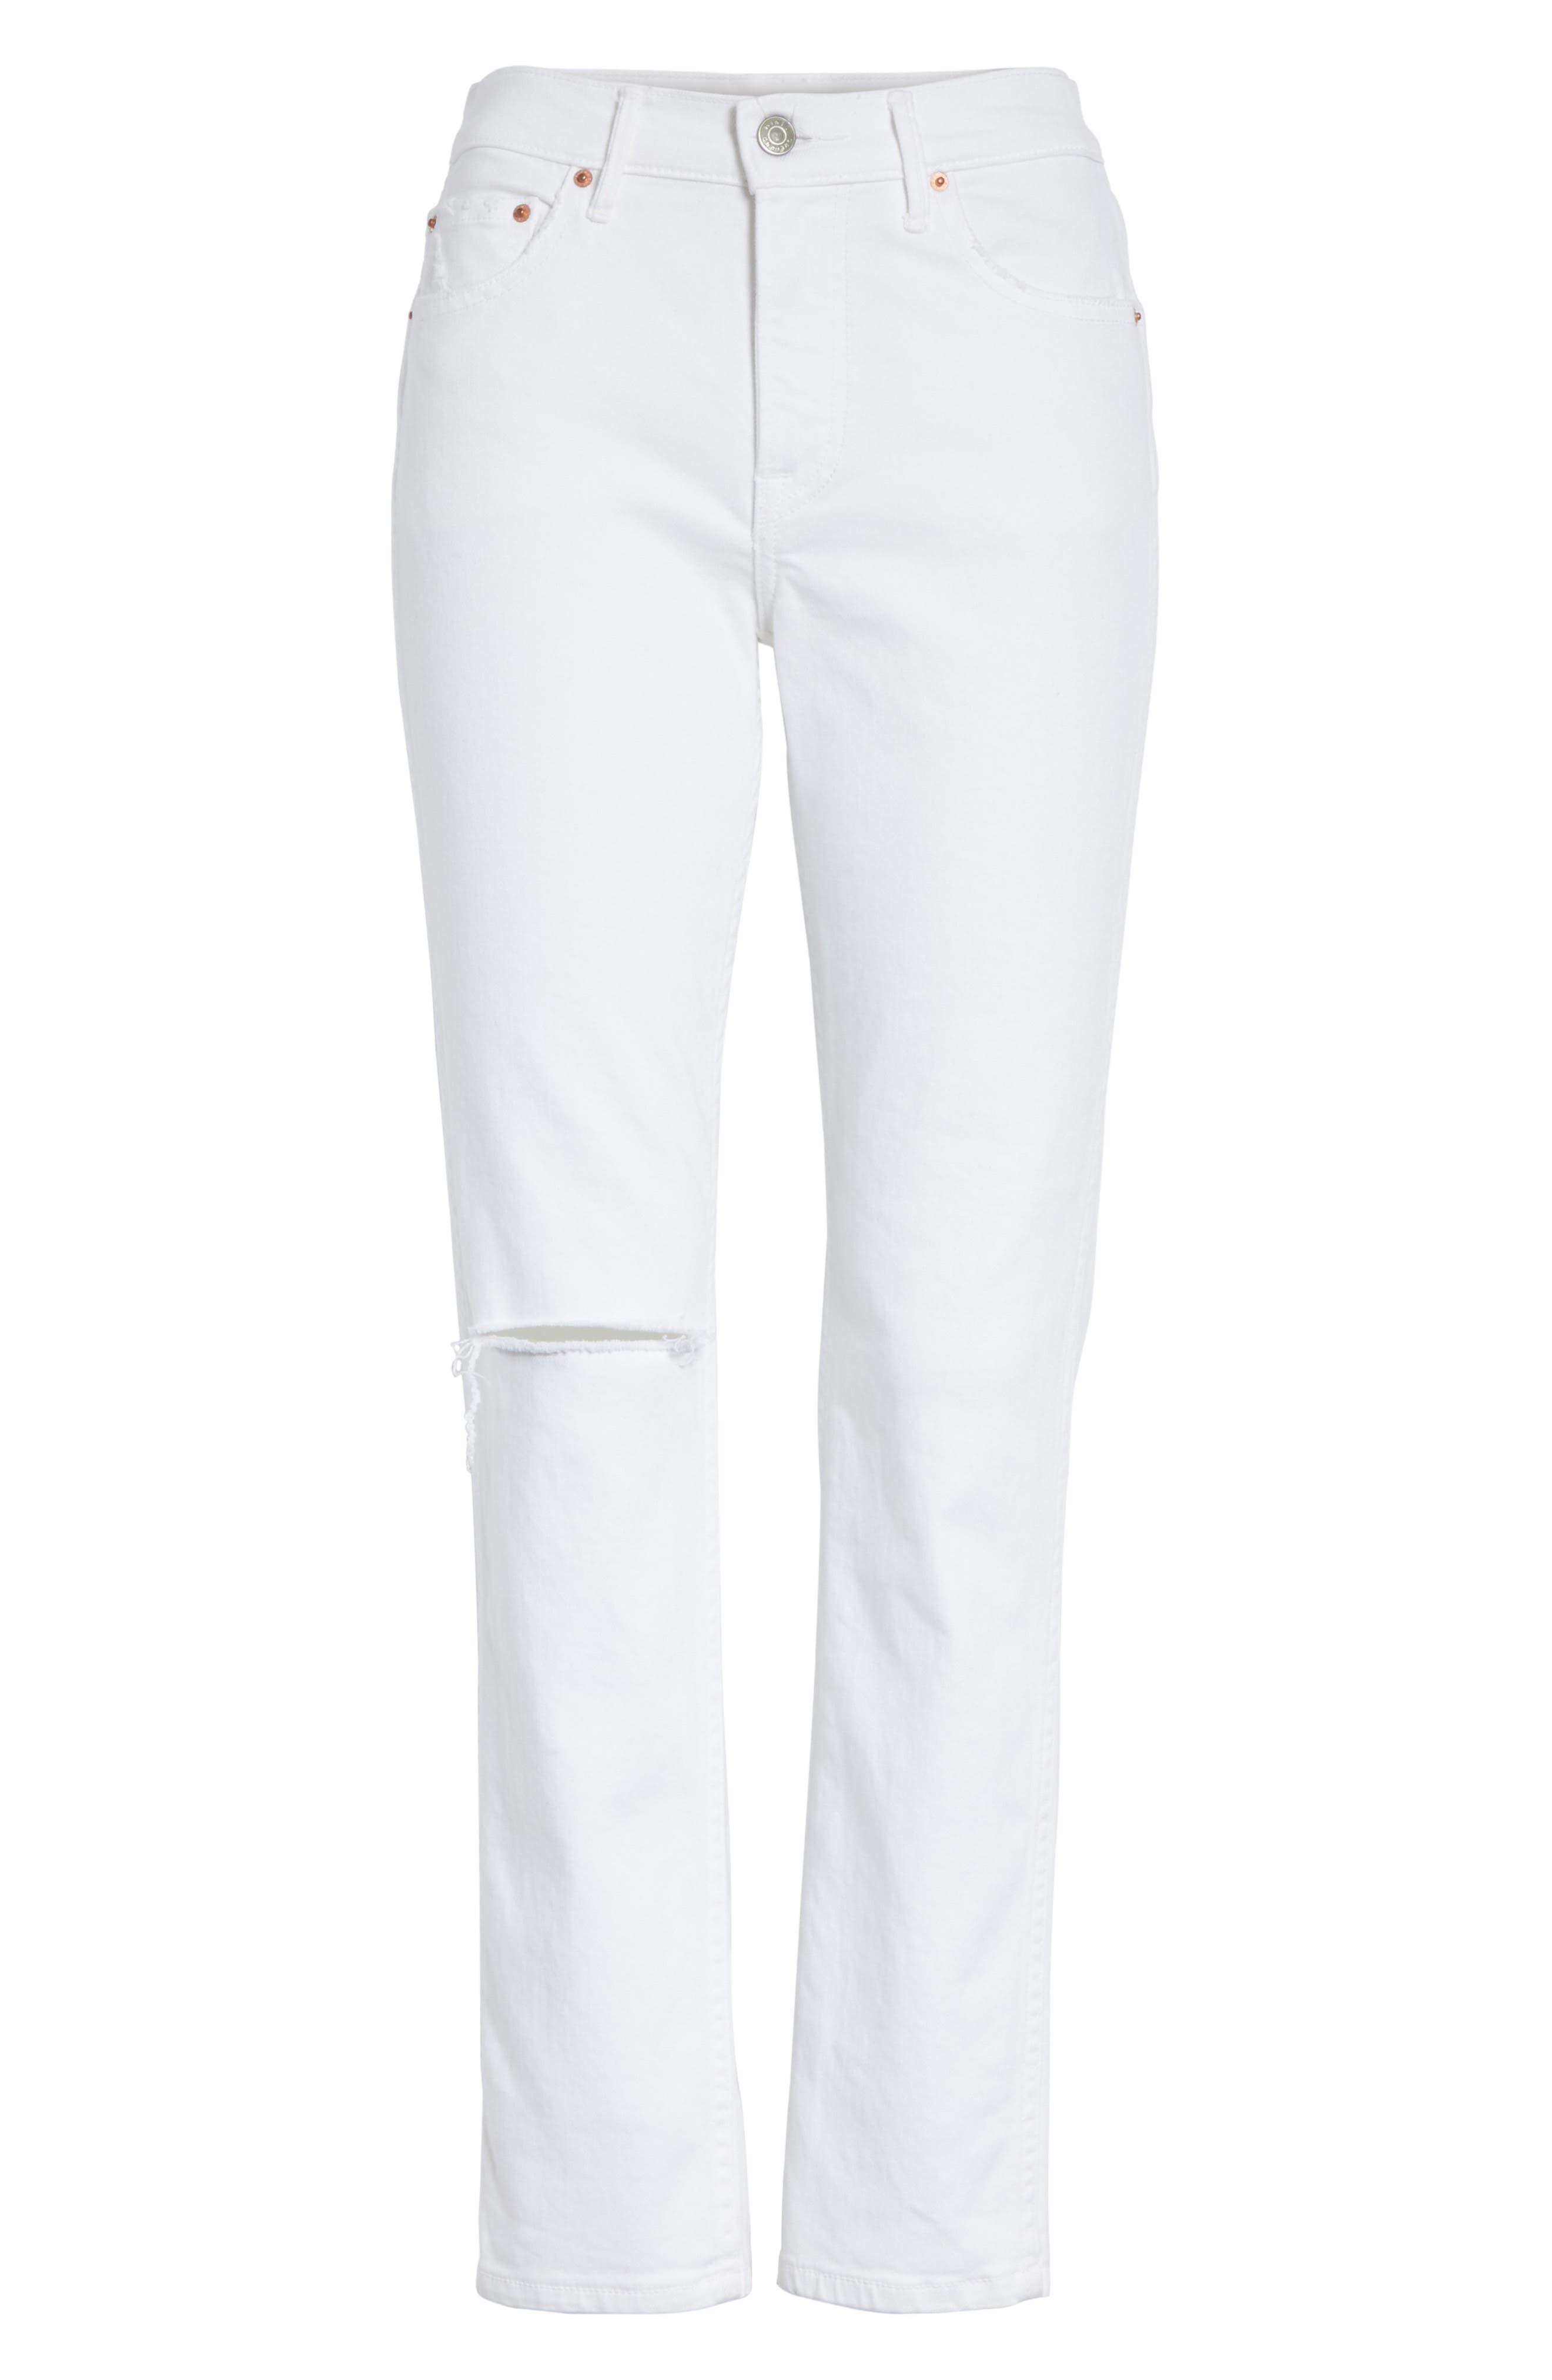 Naomi High Waist Skinny Jeans,                             Alternate thumbnail 6, color,                             Florence G587